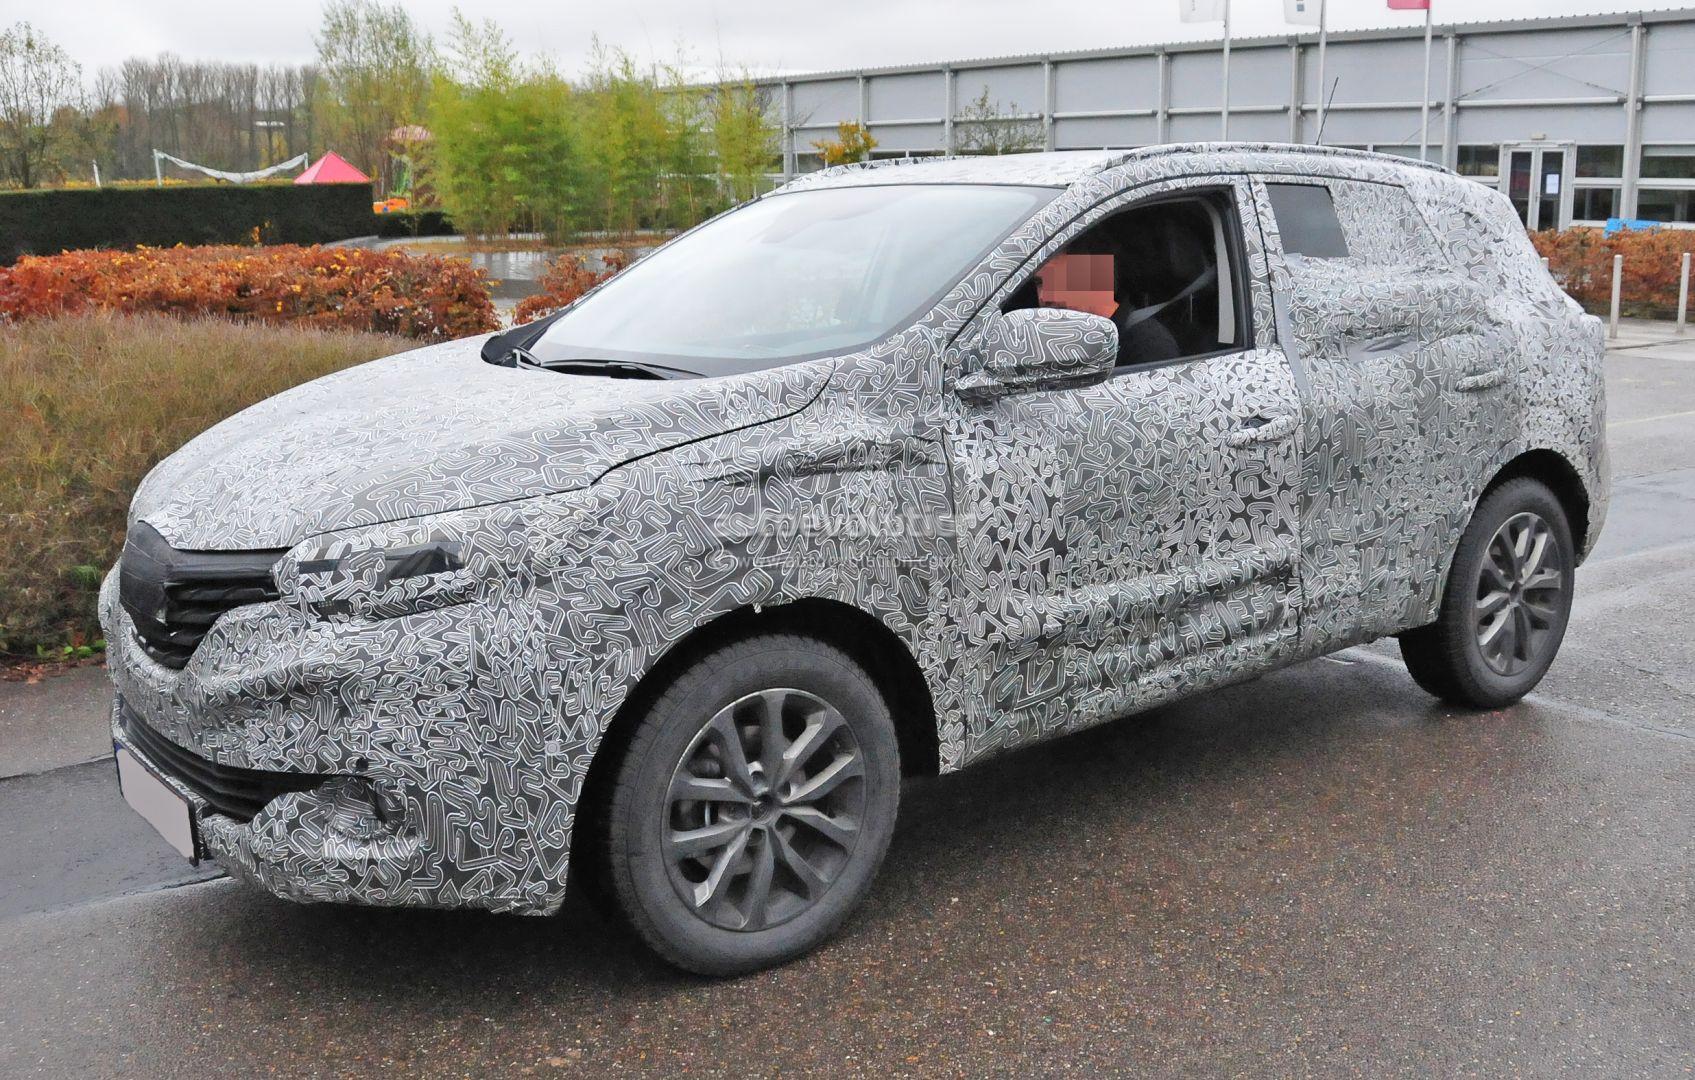 Spy Video 2016 Renault Racoon Crossover Suv Filmed In Germany